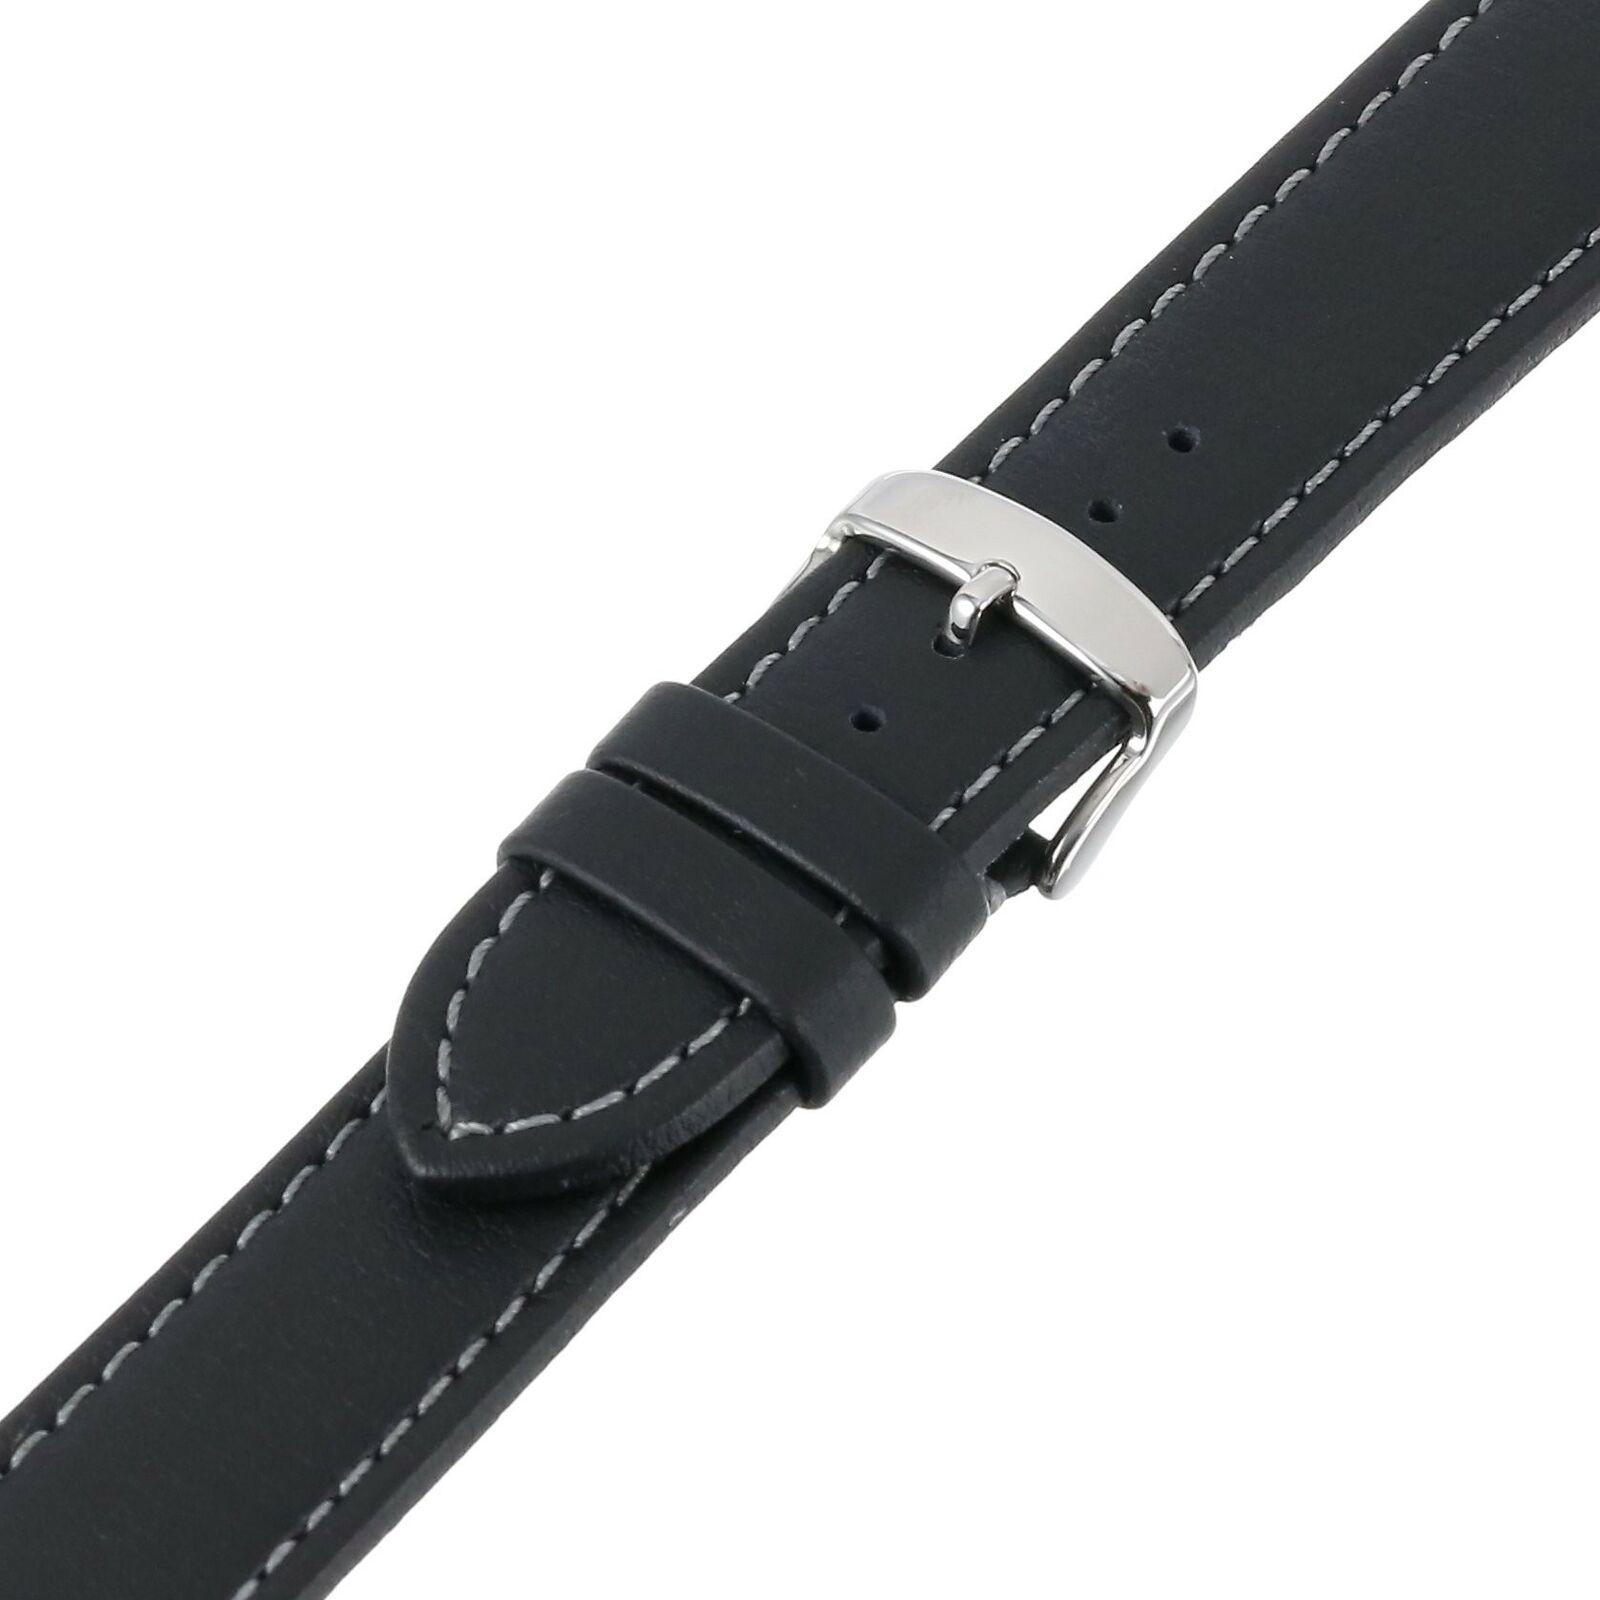 24mm Hadley Roma Genuine Lorica Black Vegan Leather - Invicta Style